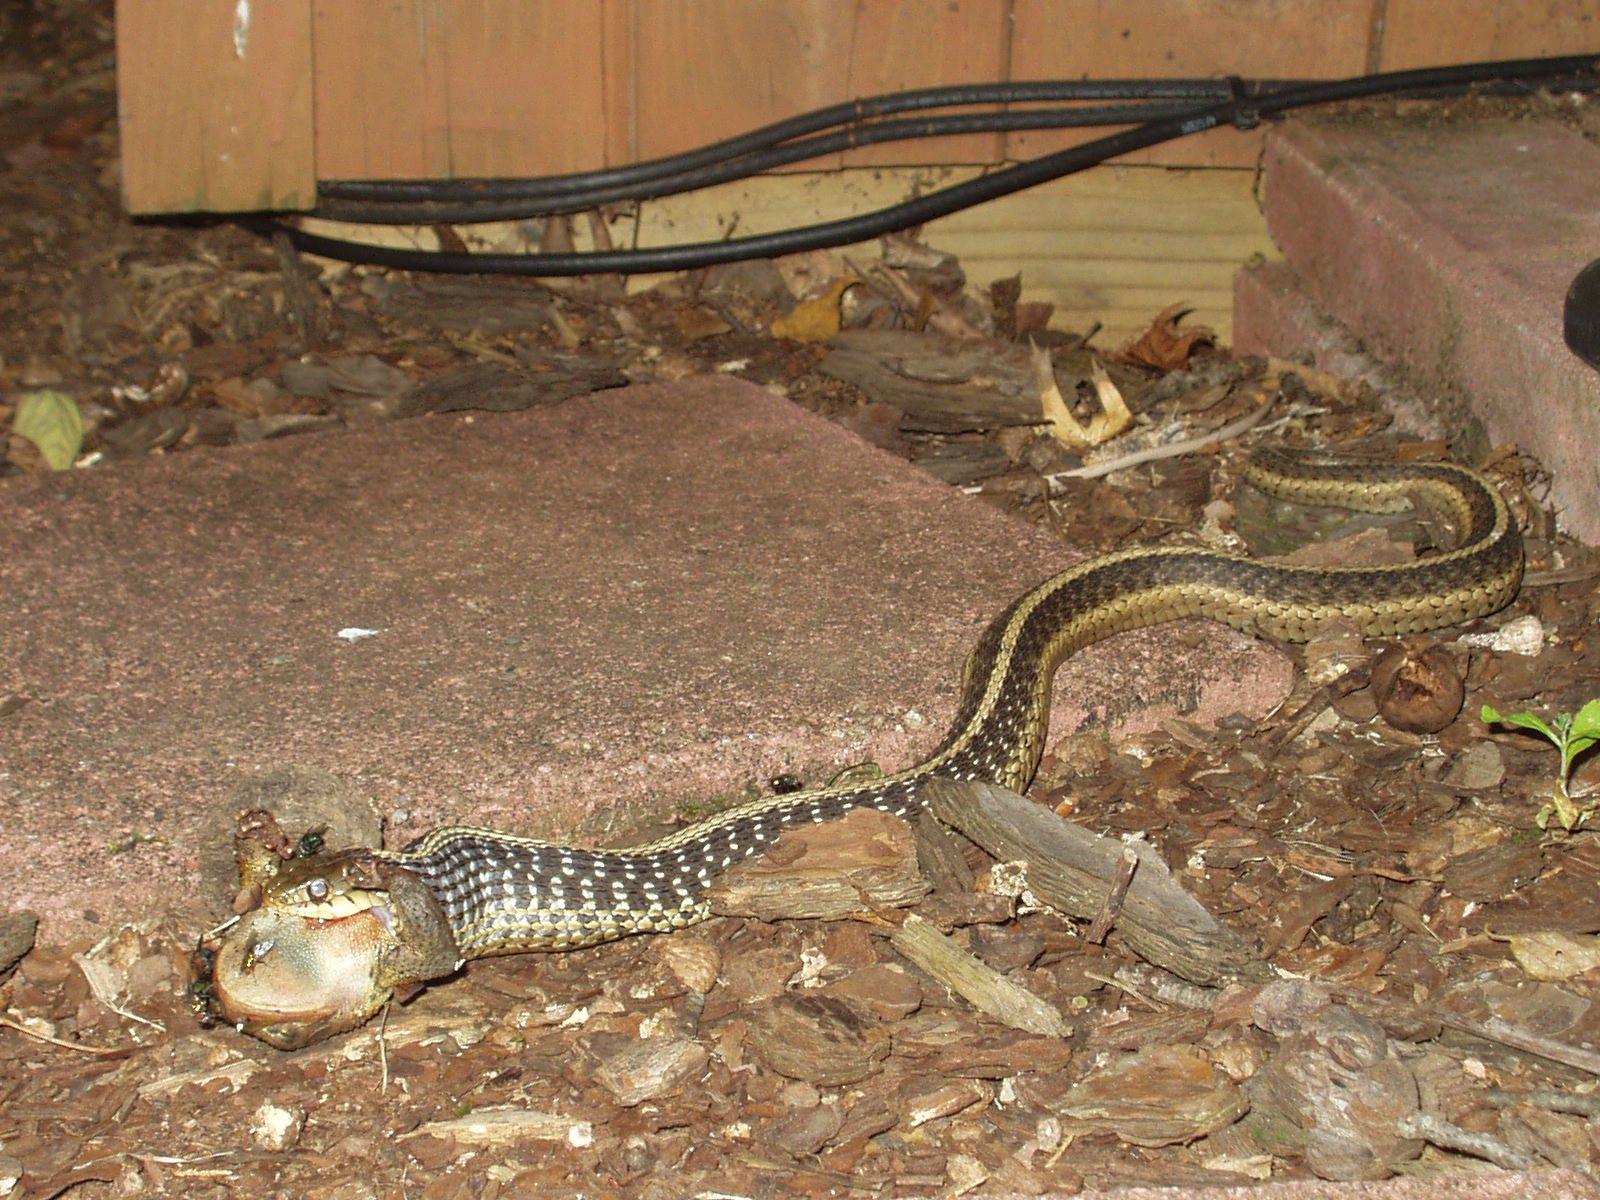 Snake eating frog - 1 of 2